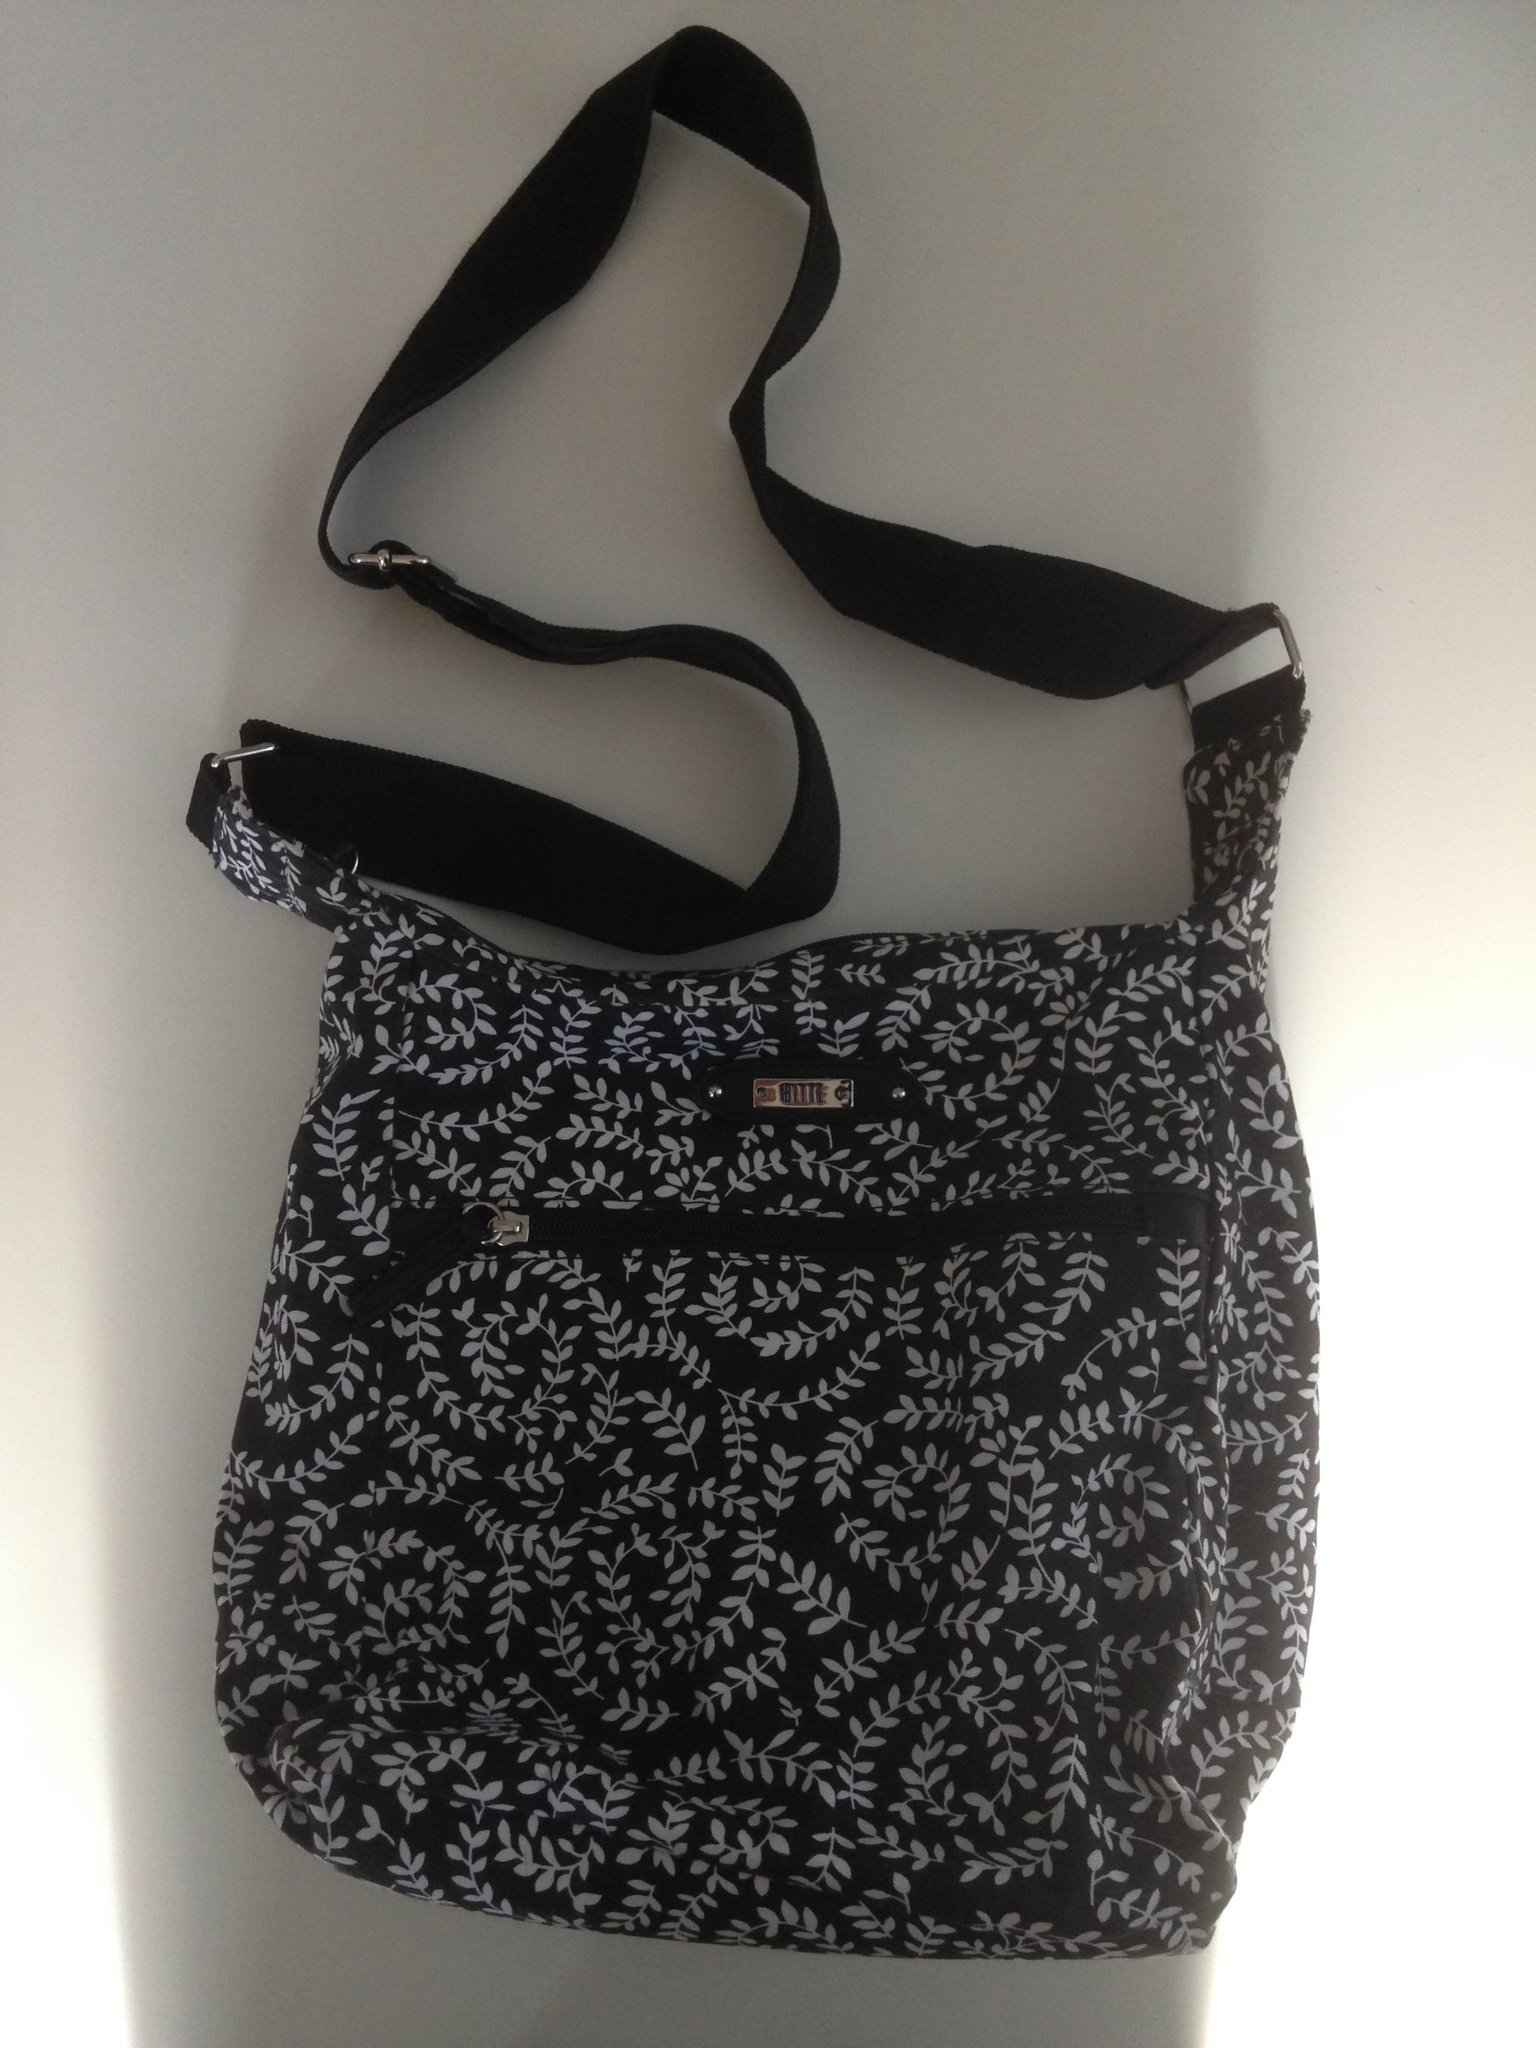 Axelremsväska i tyg, svartvit mönstrad (349527469) ᐈ Köp